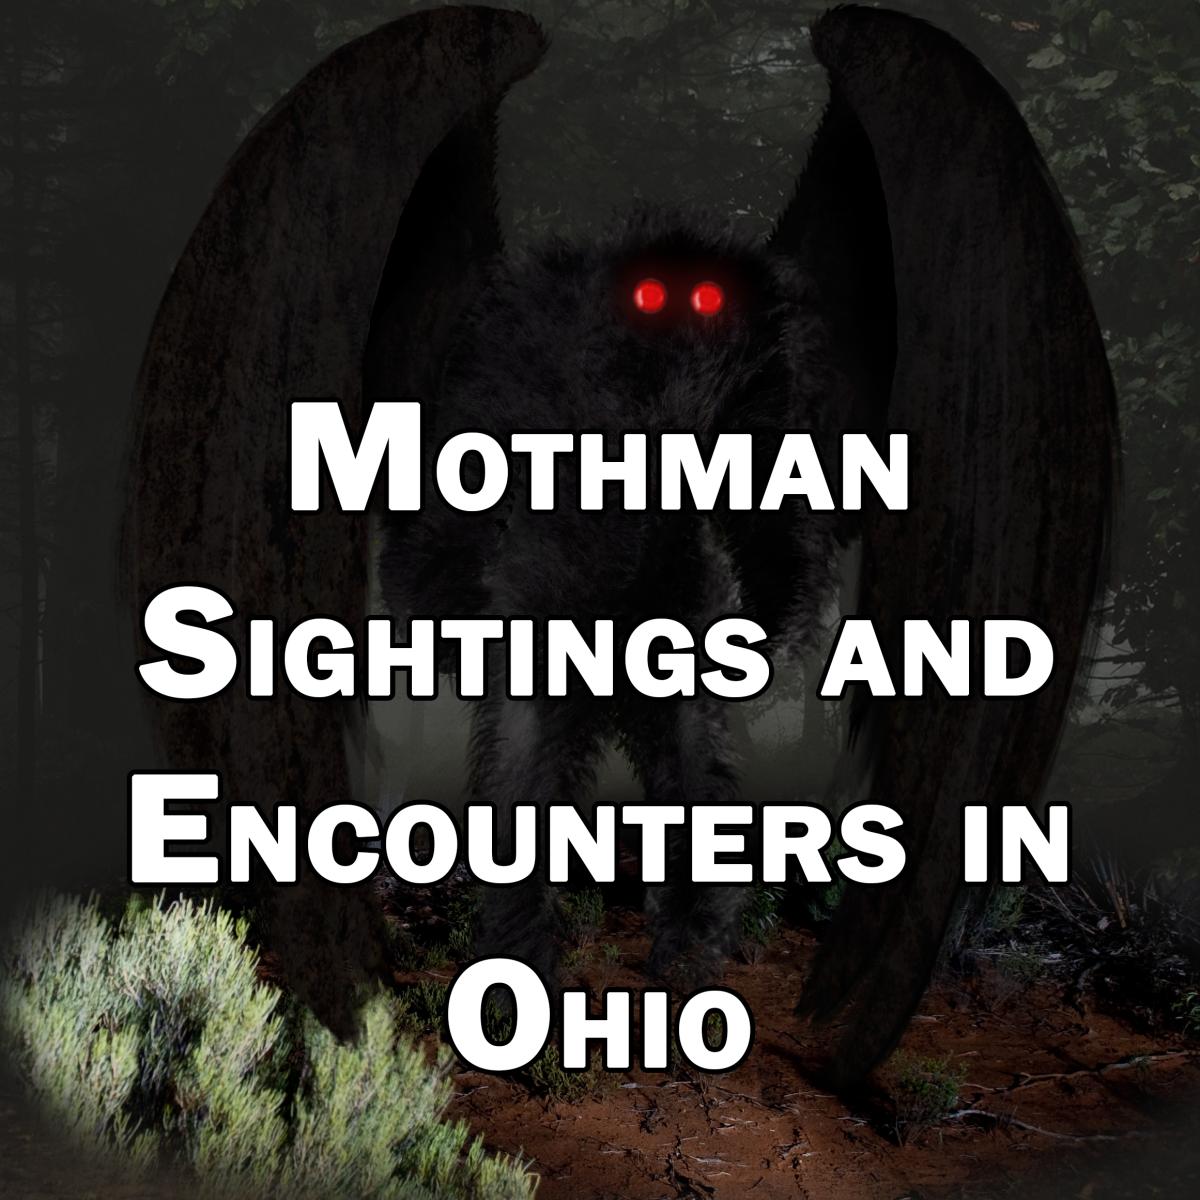 Mothman Sightings and Encounters in Ohio